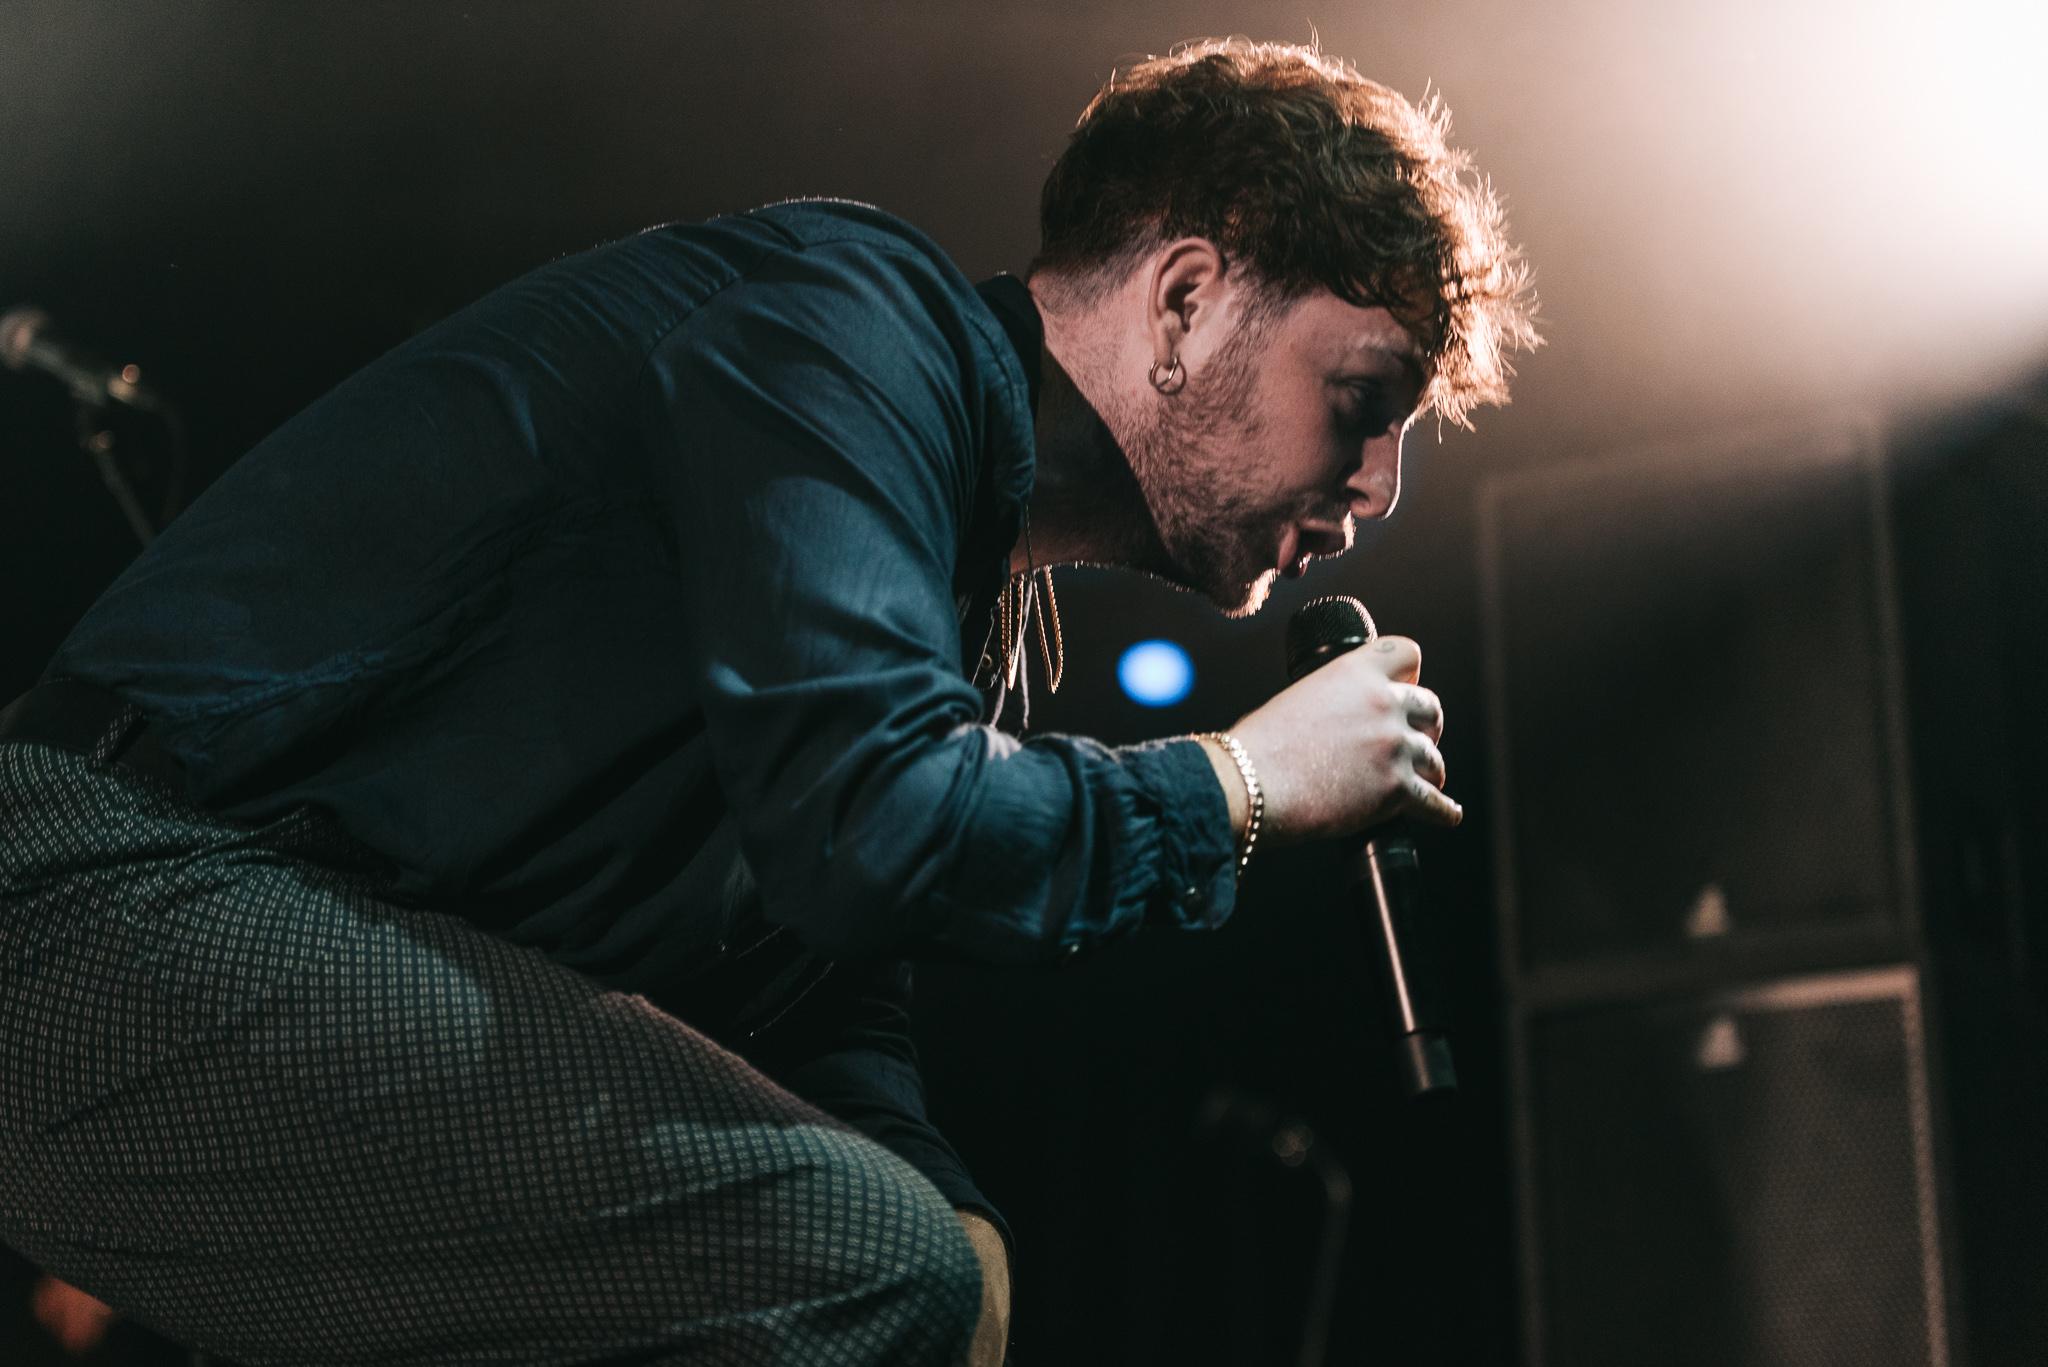 Tom Grennan – Elli Ingram – Everything is Imagined – Manchester,UK 12.10.18